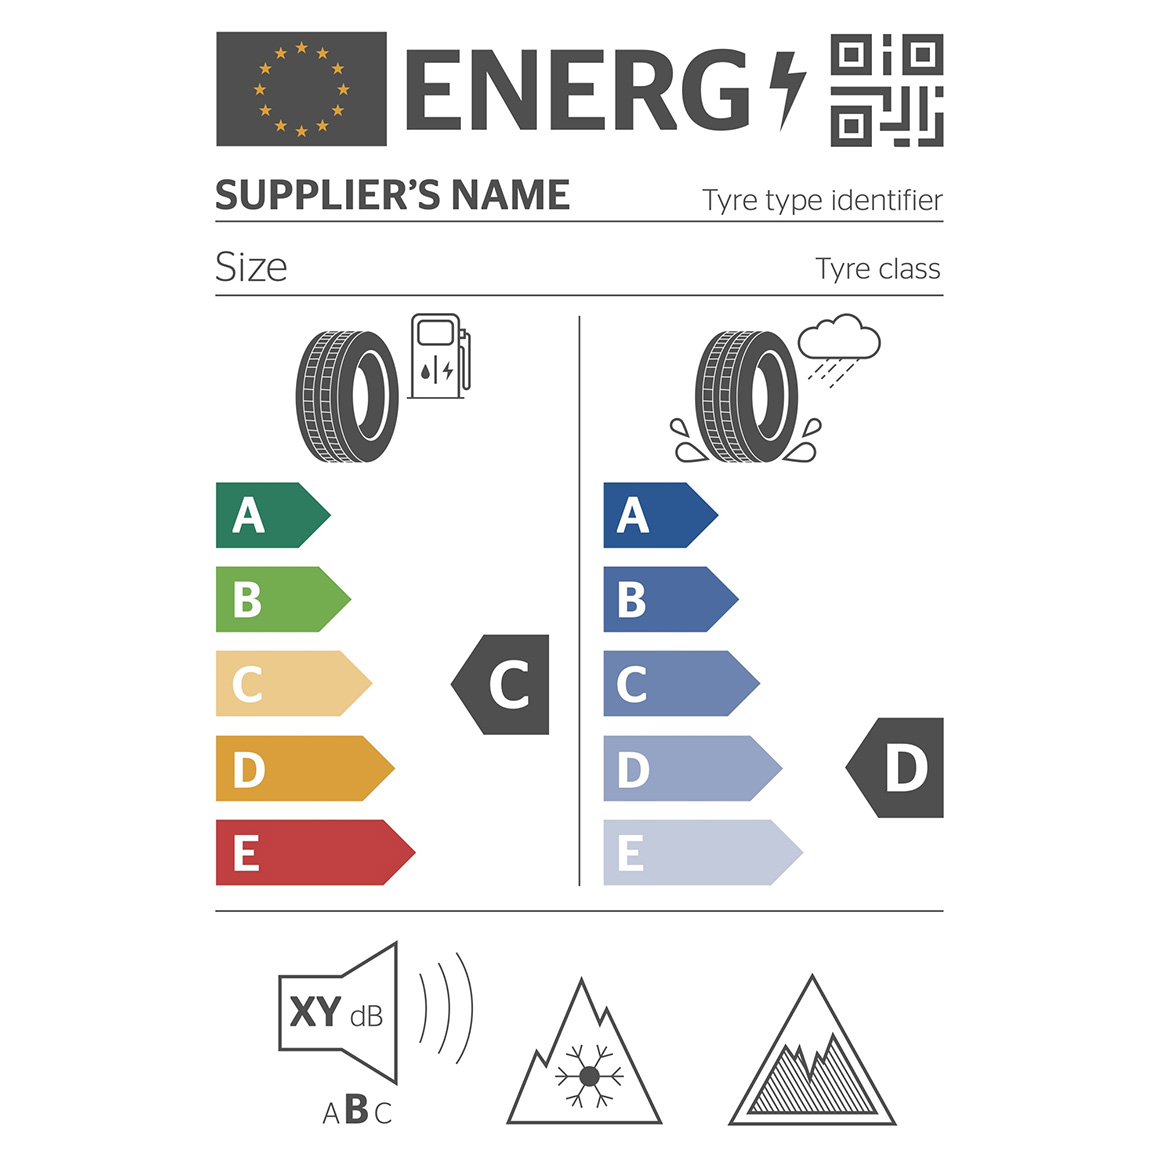 eu-tire-label-image